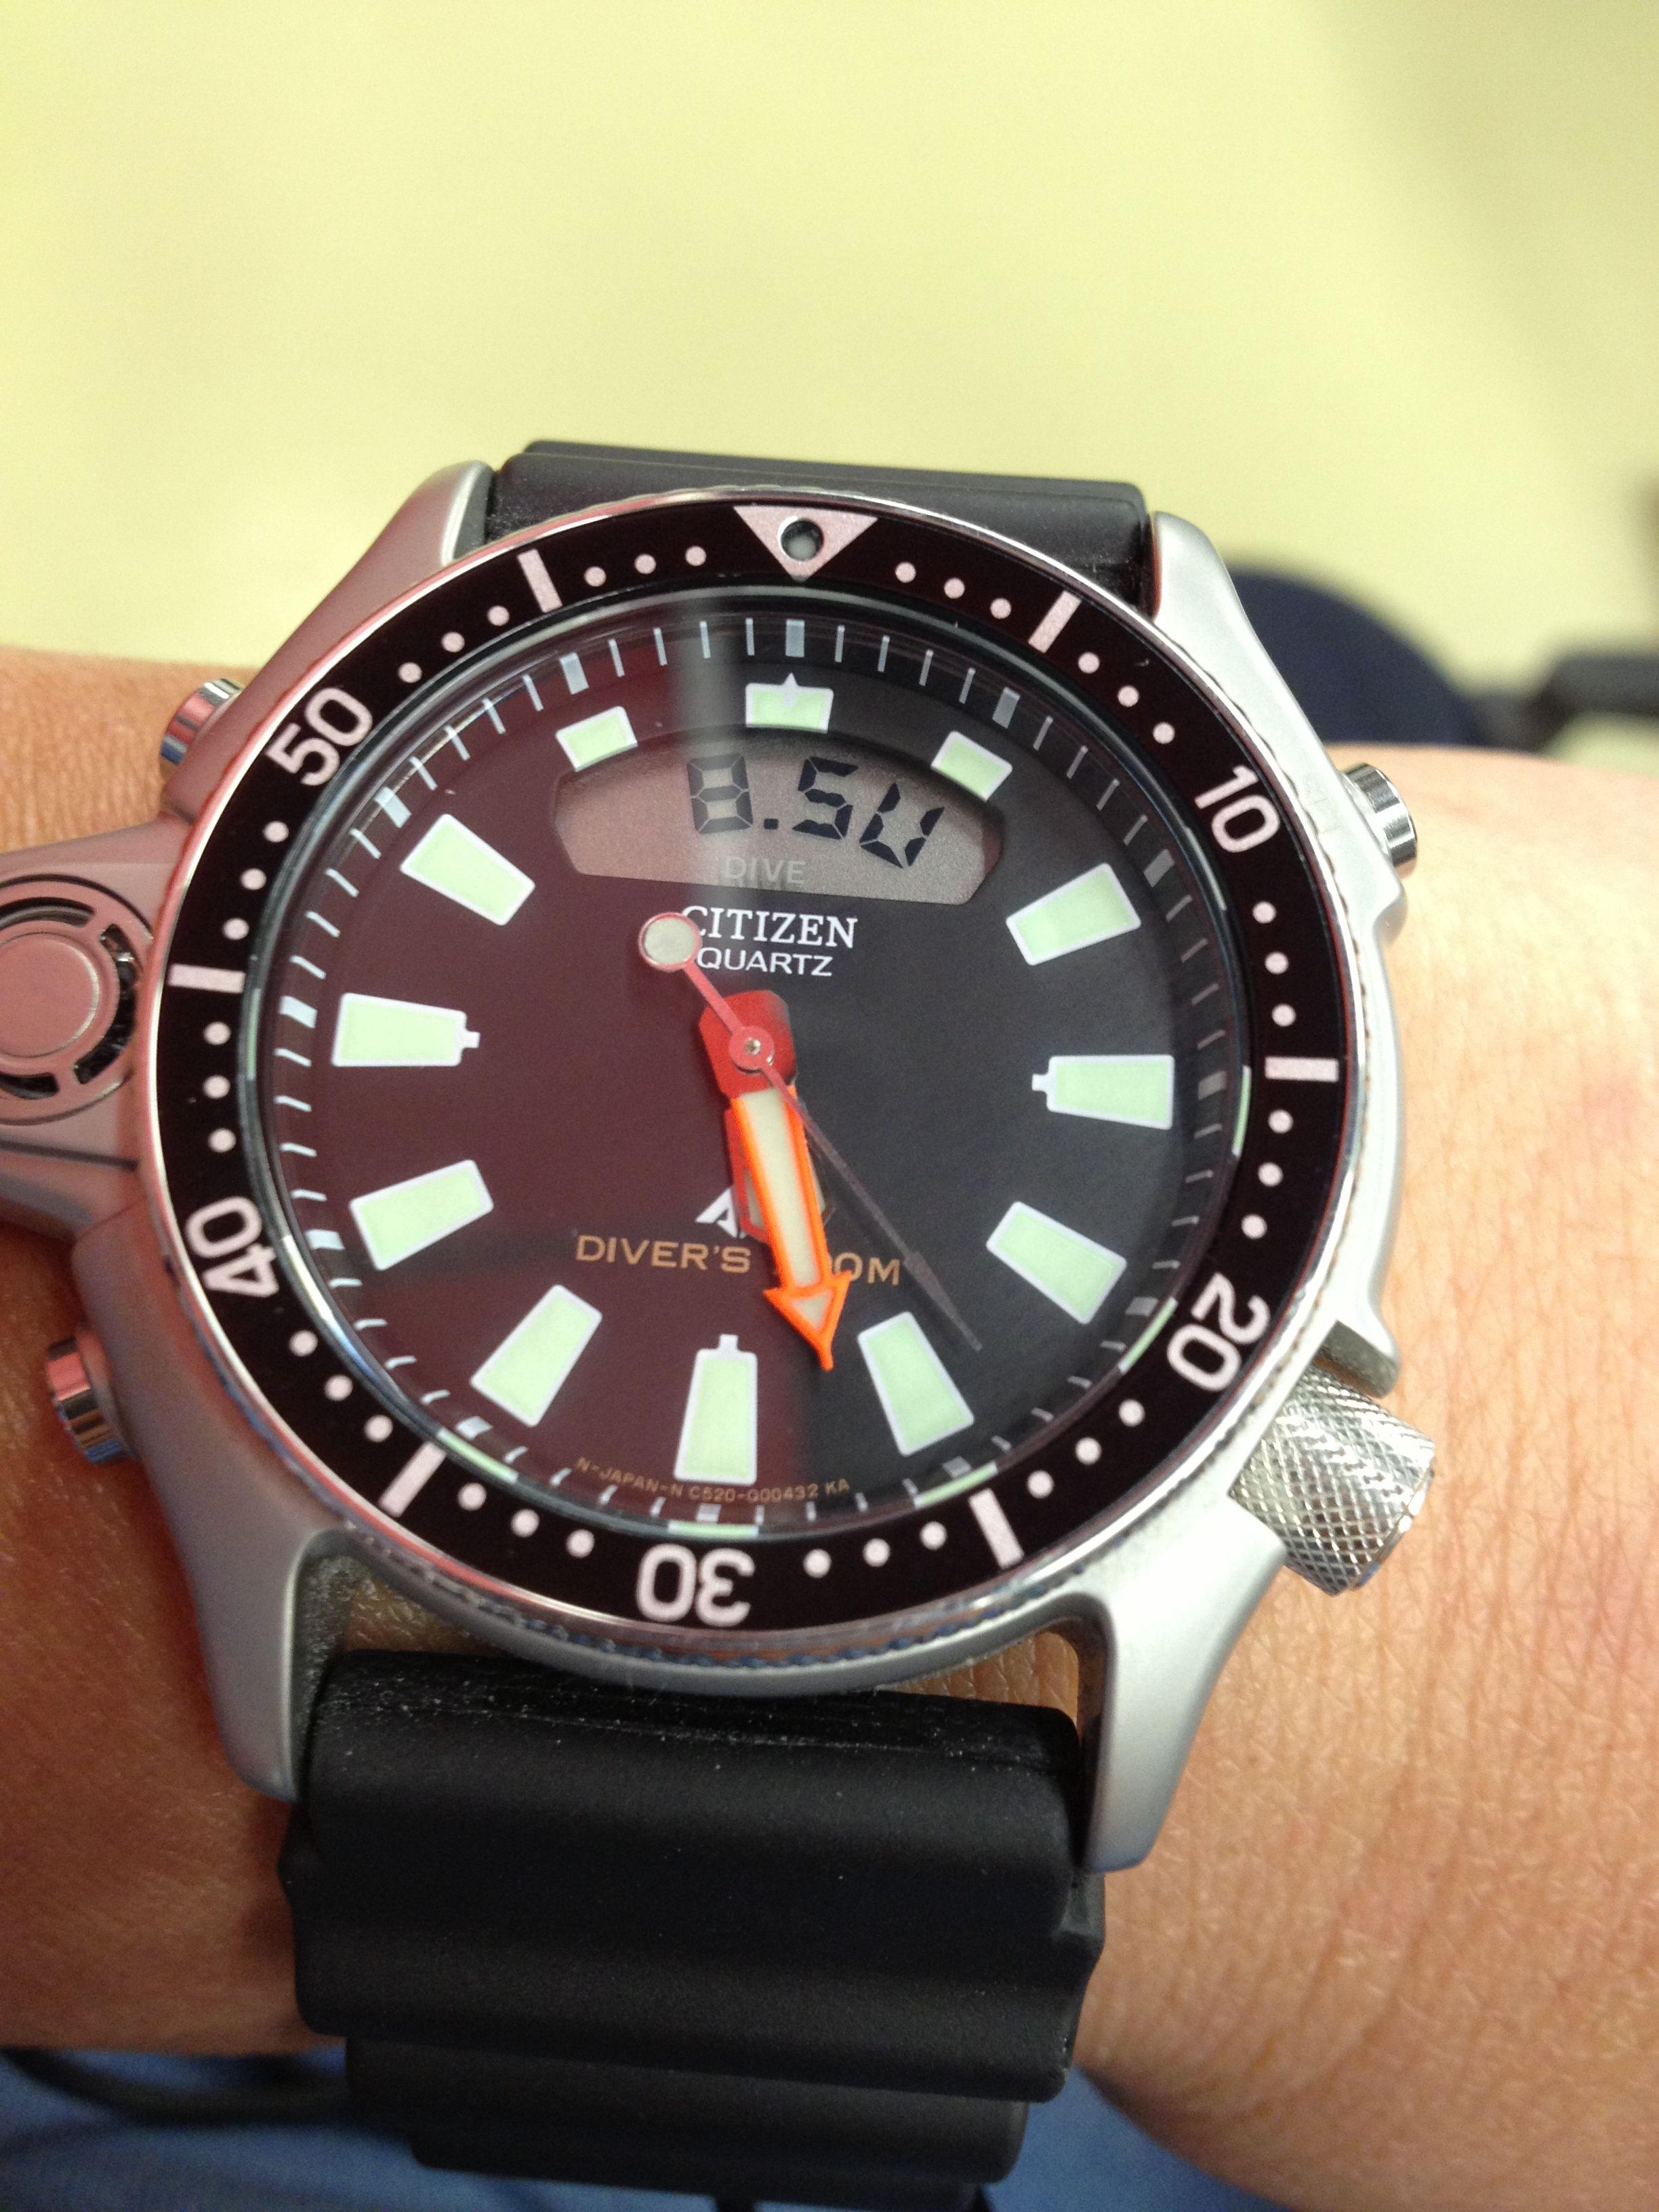 8d6e42f4d0a My very own Citizen Aqualand C520 dive watches